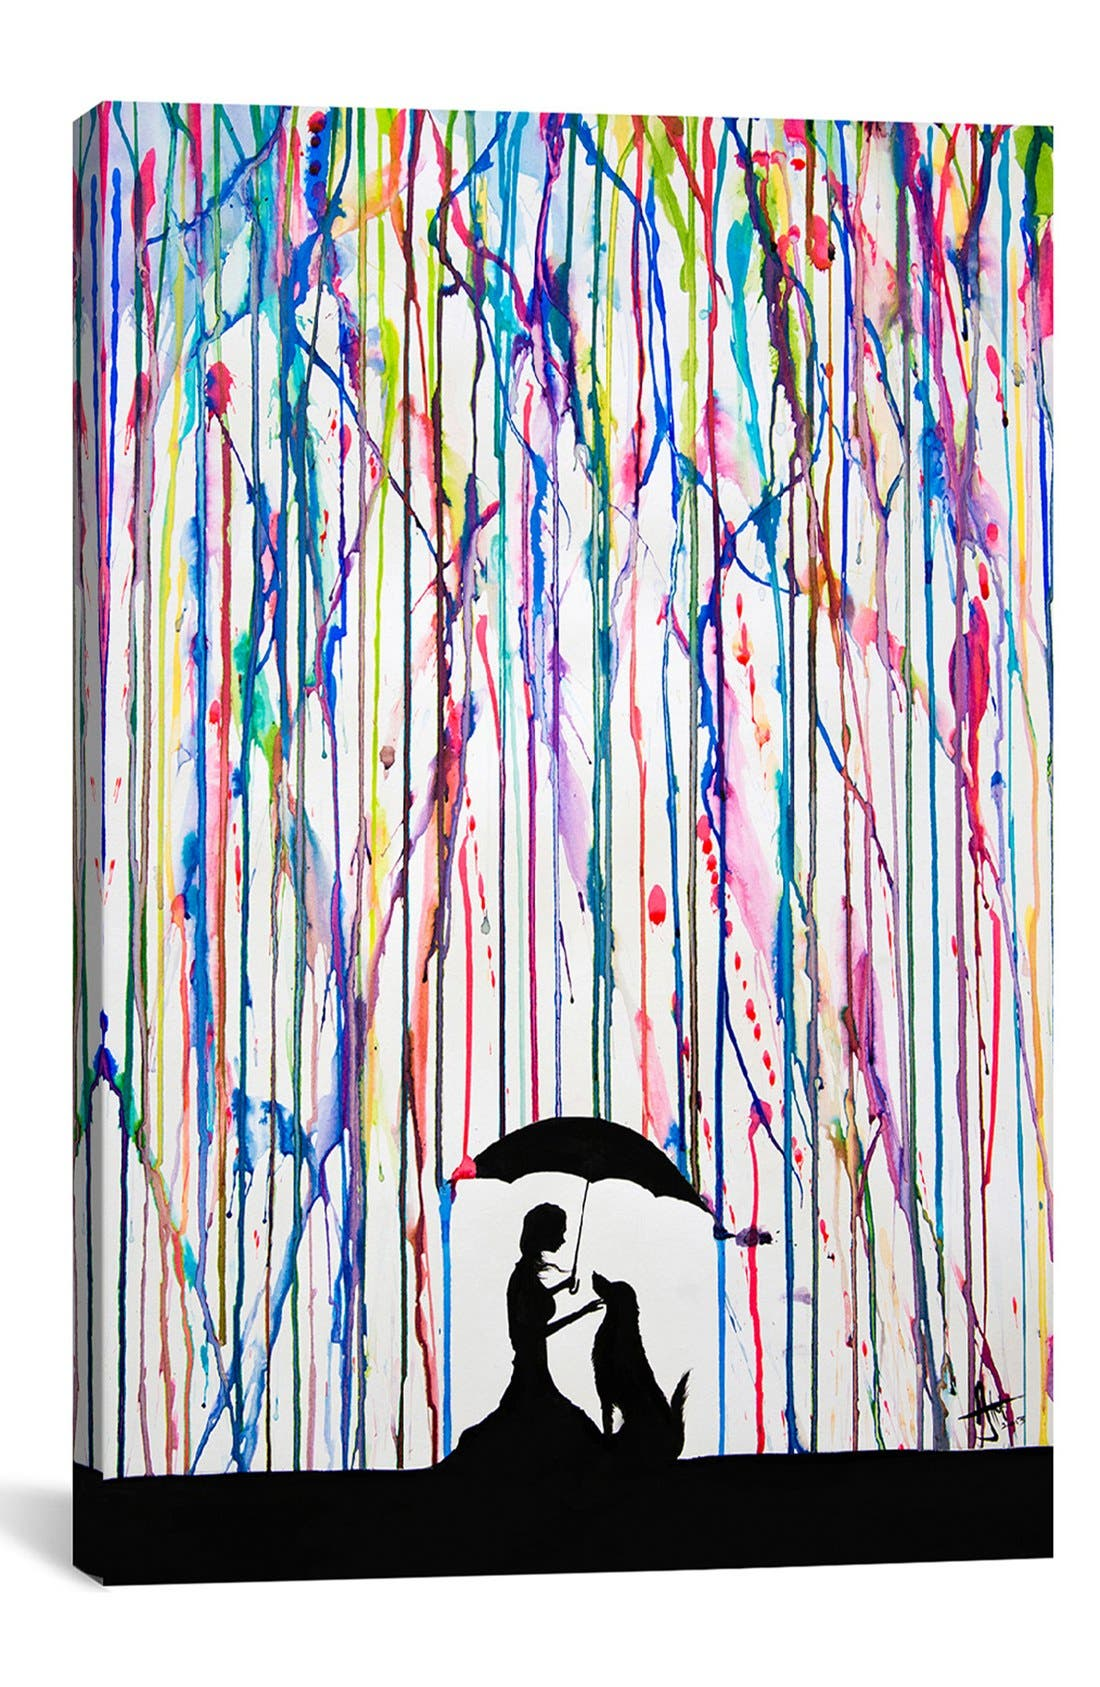 iCanvas 'Sempre' Giclée Print Canvas Art